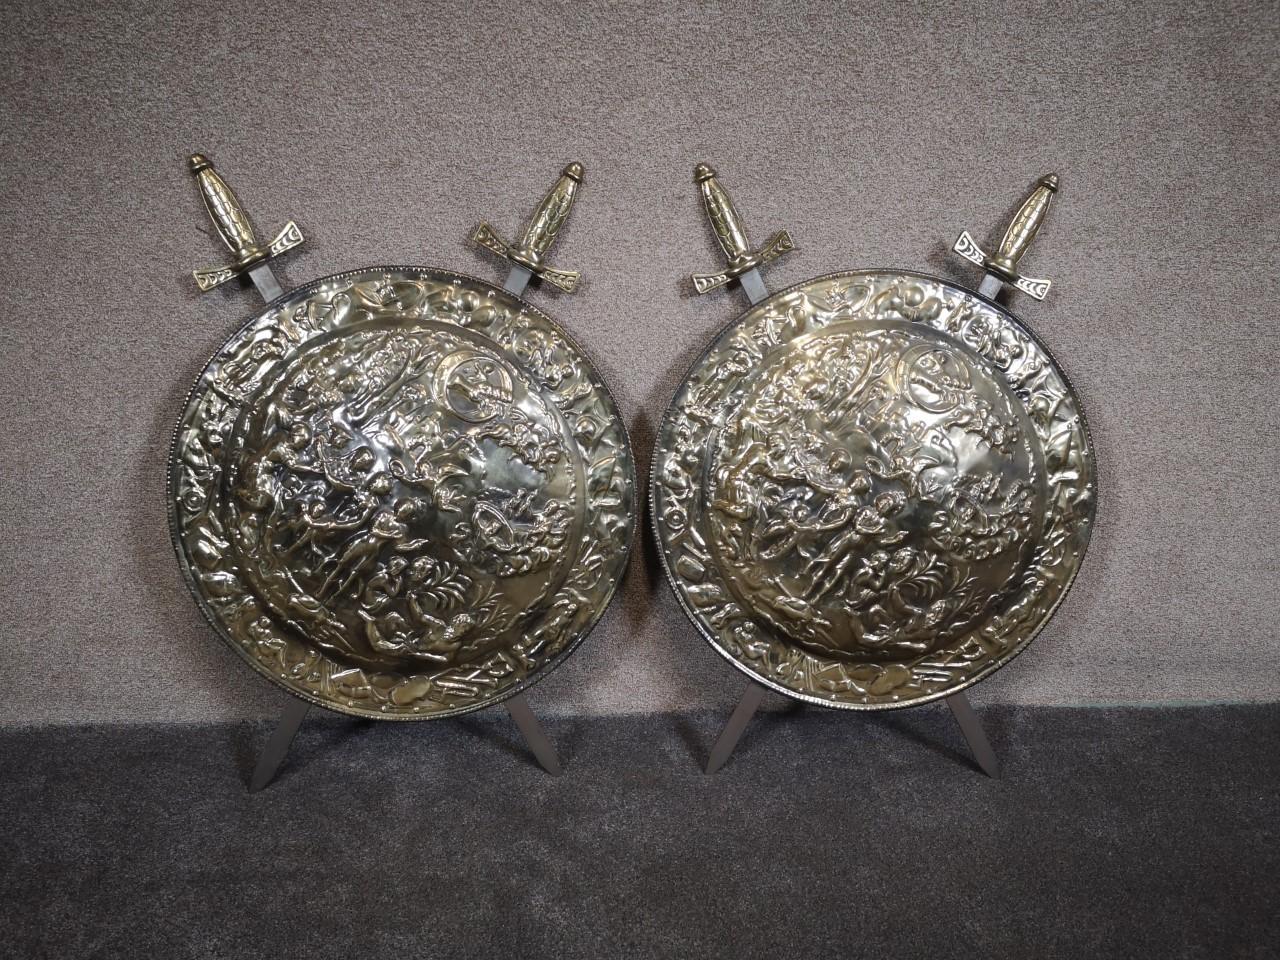 Pair of brass plaques画像